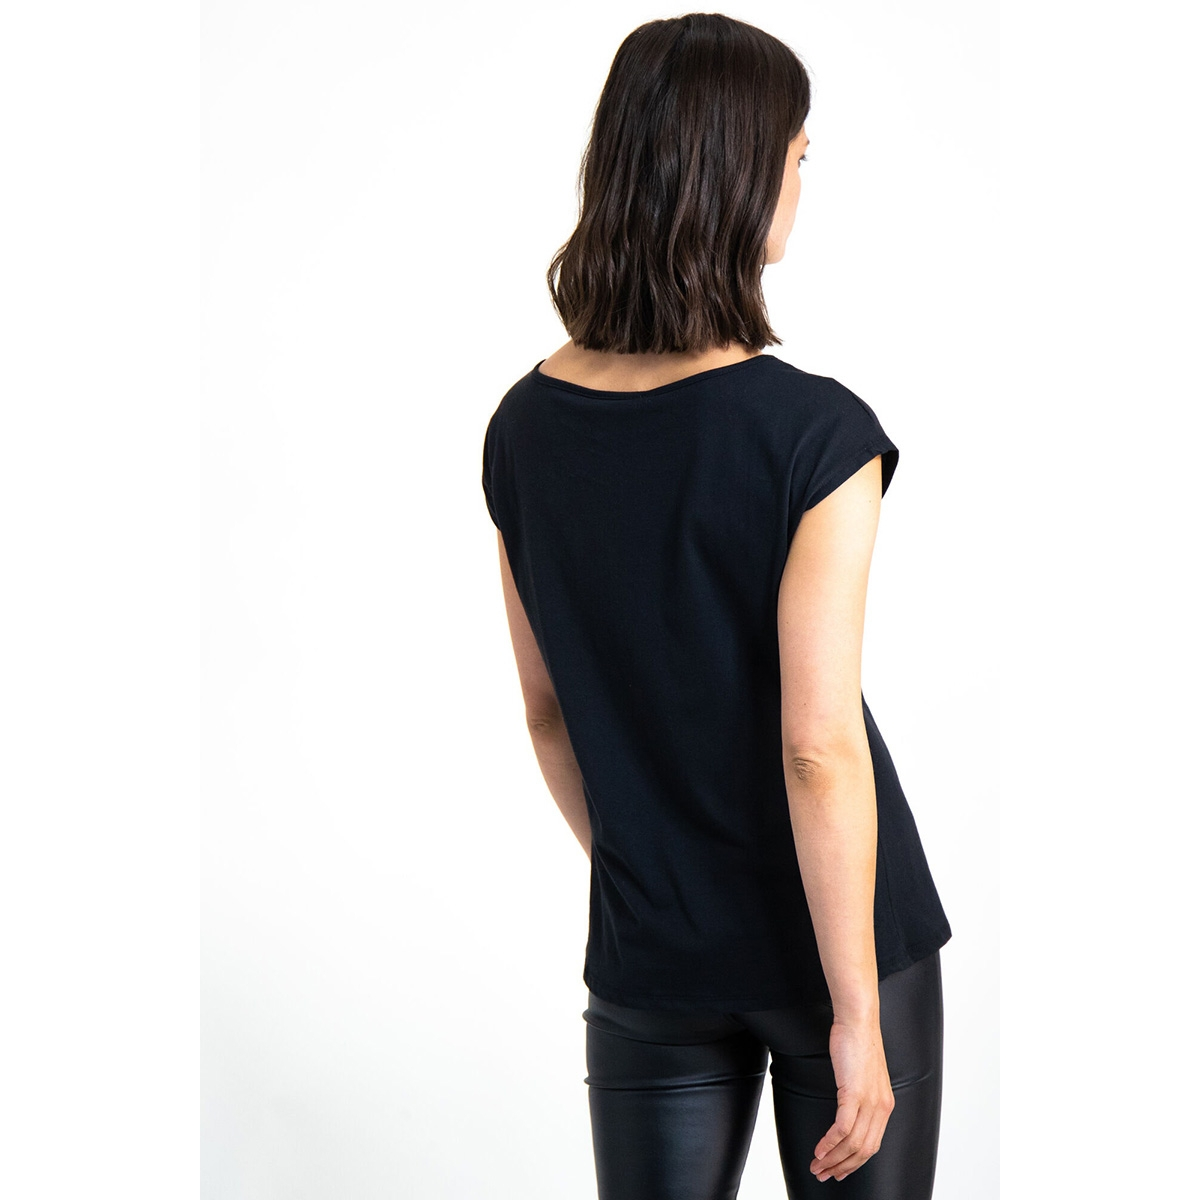 t shirt met opdruk i90004 garcia t-shirt 60 black